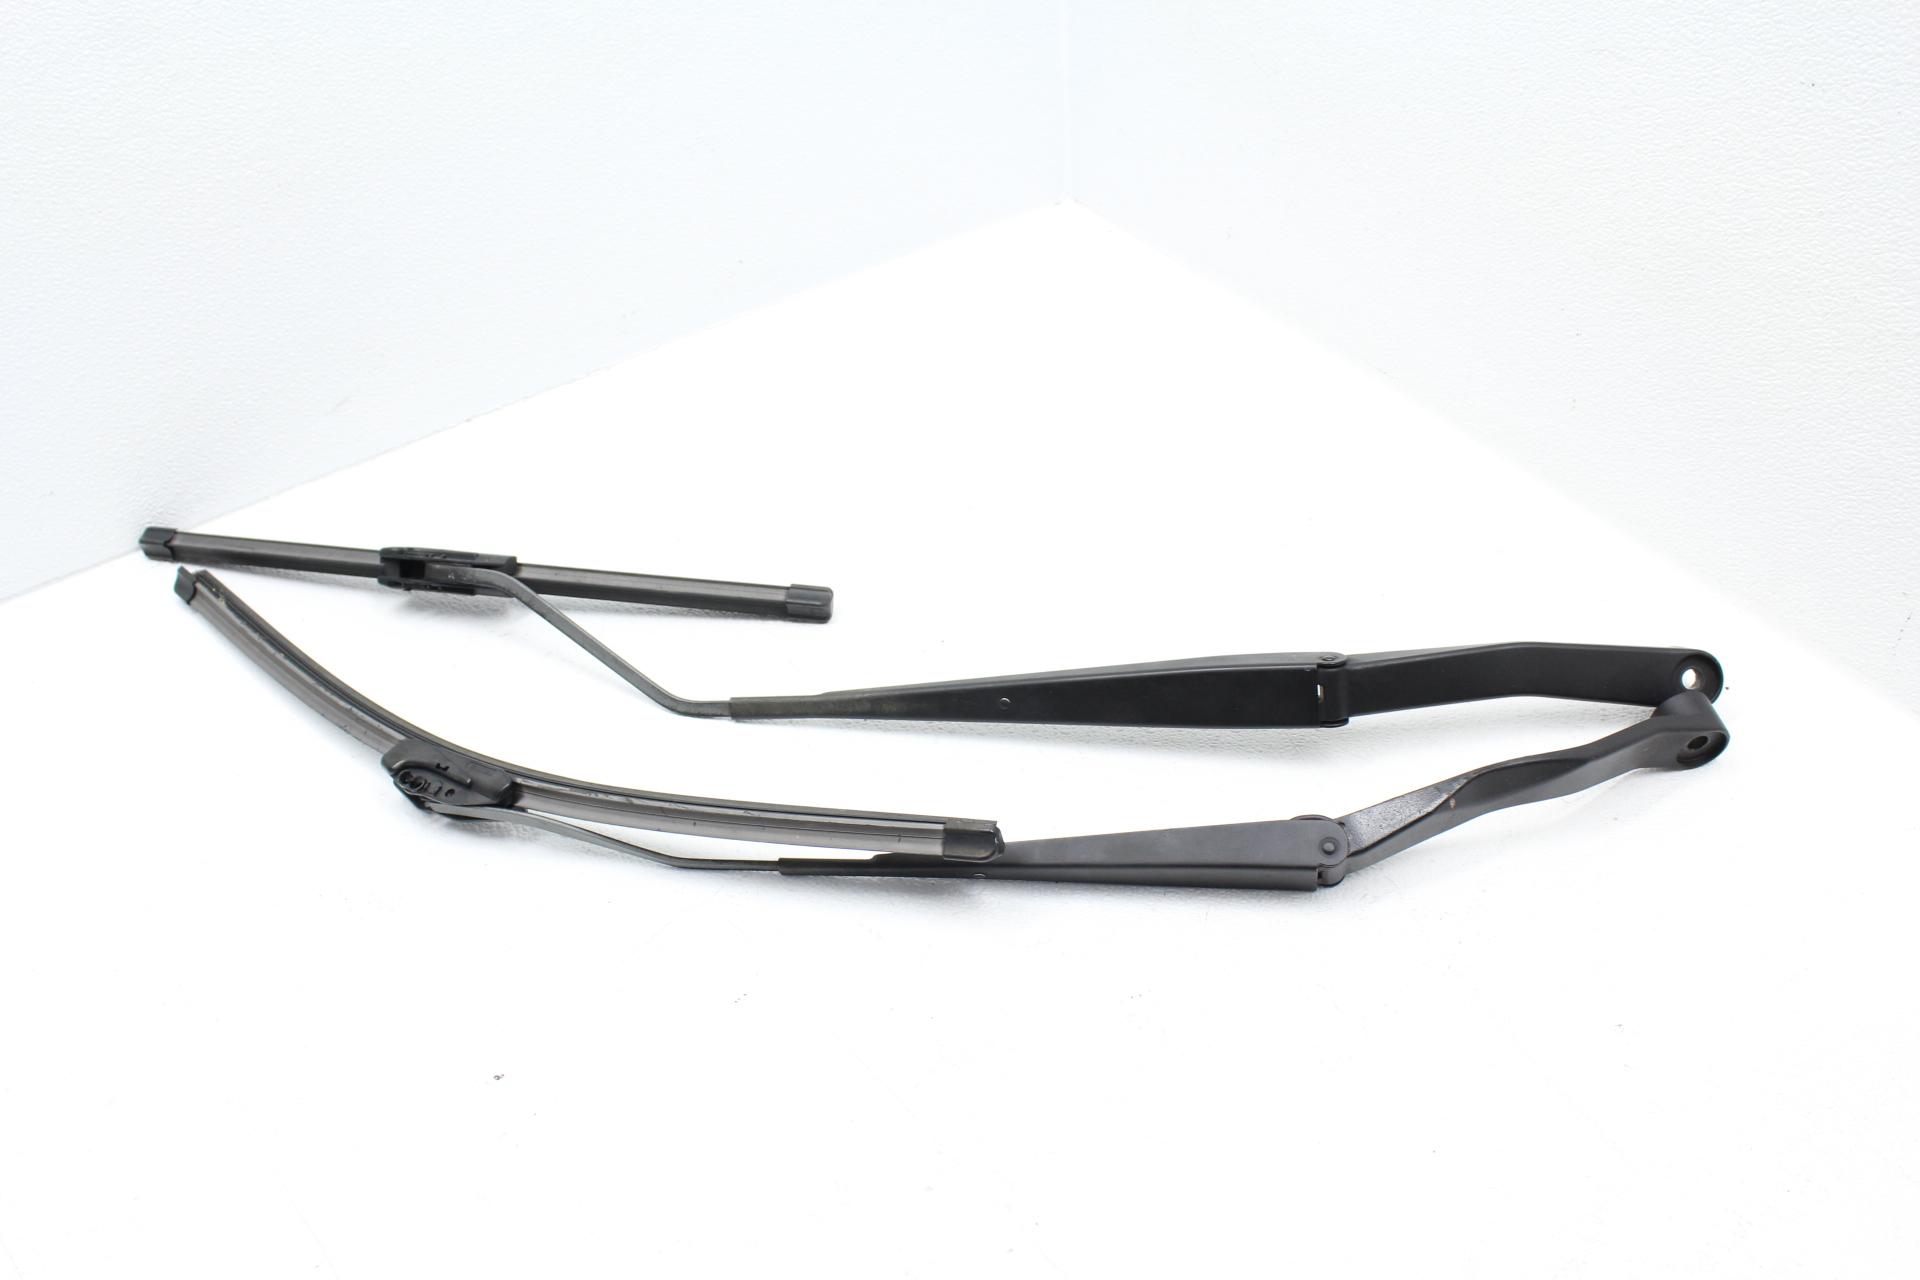 Subaru Wrx Sti Wind Sheild Wipers Amp Wiper Blades